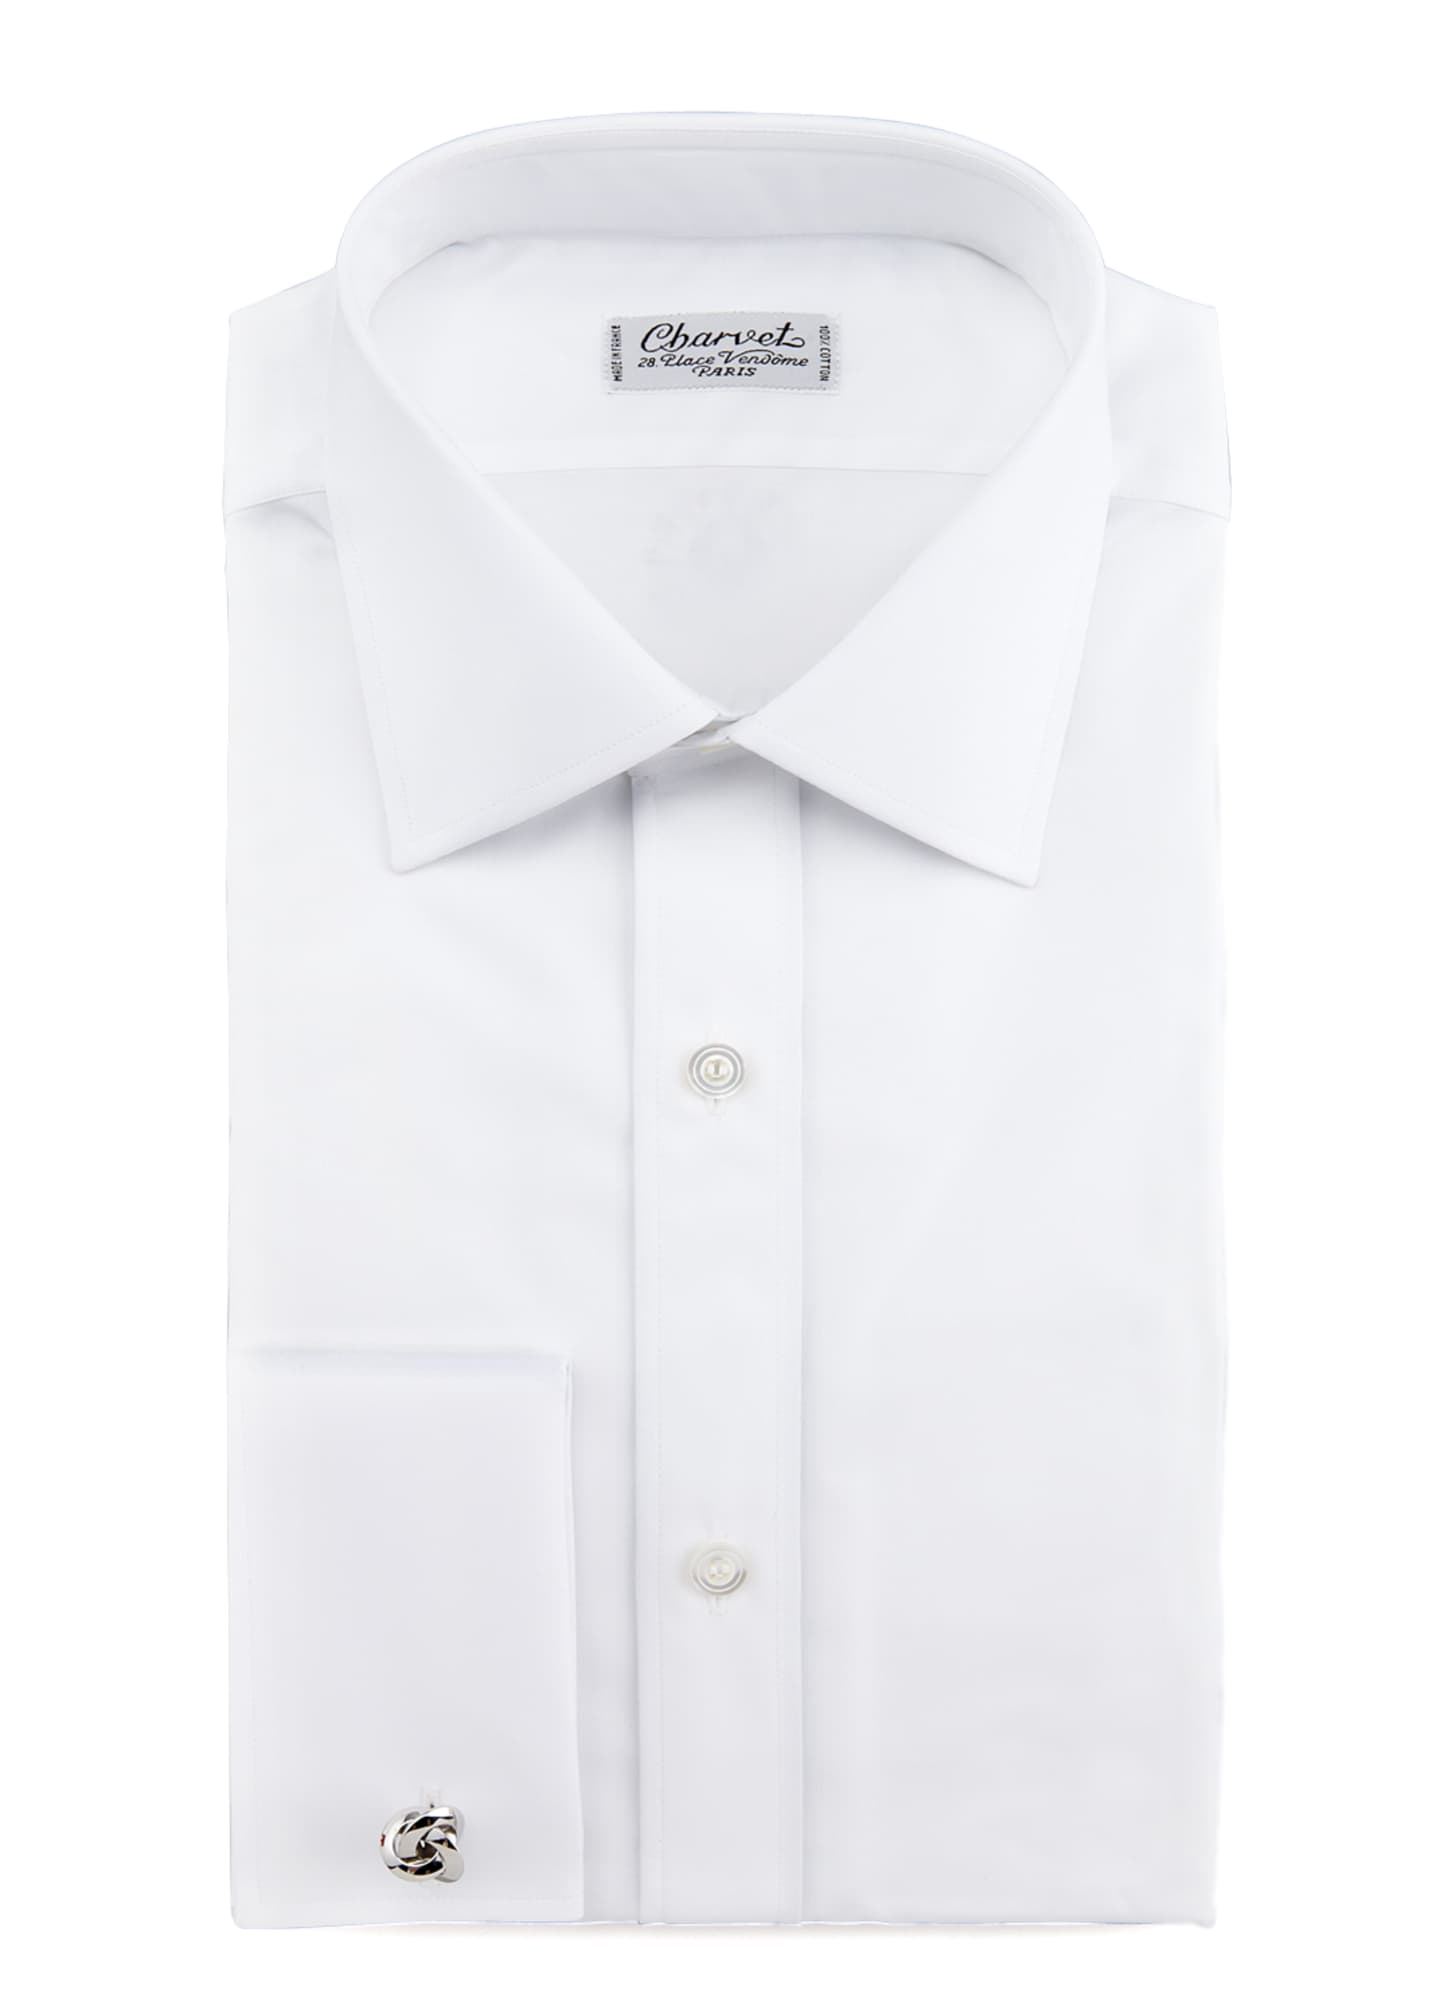 Charvet French-Cuff Dress Shirt